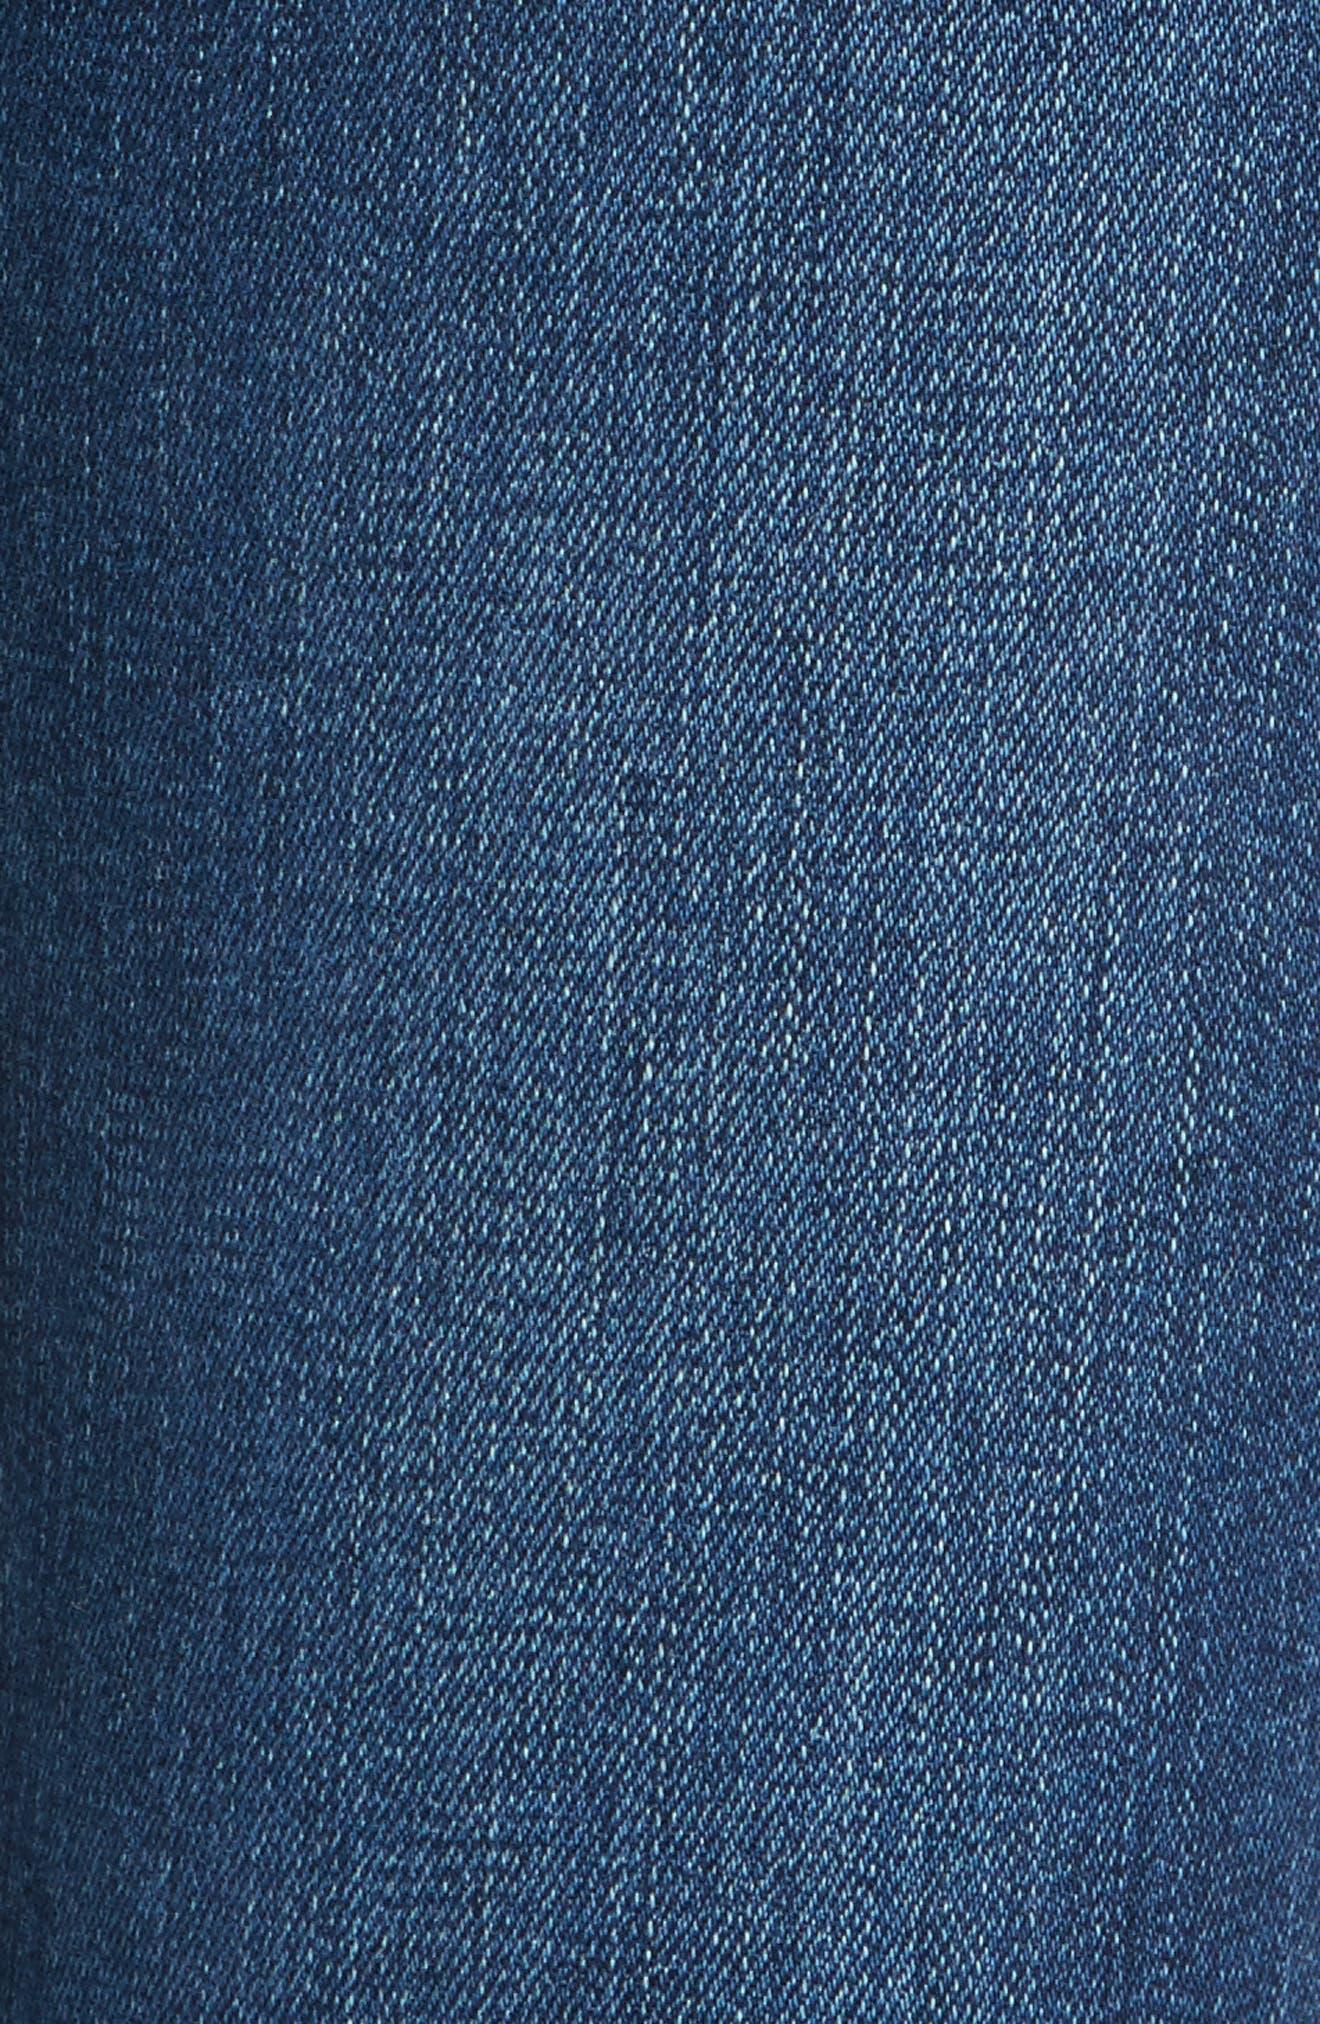 Alternate Image 5  - FRAME Le High High Waist Staggered Hem Slim Jeans (Baisley)